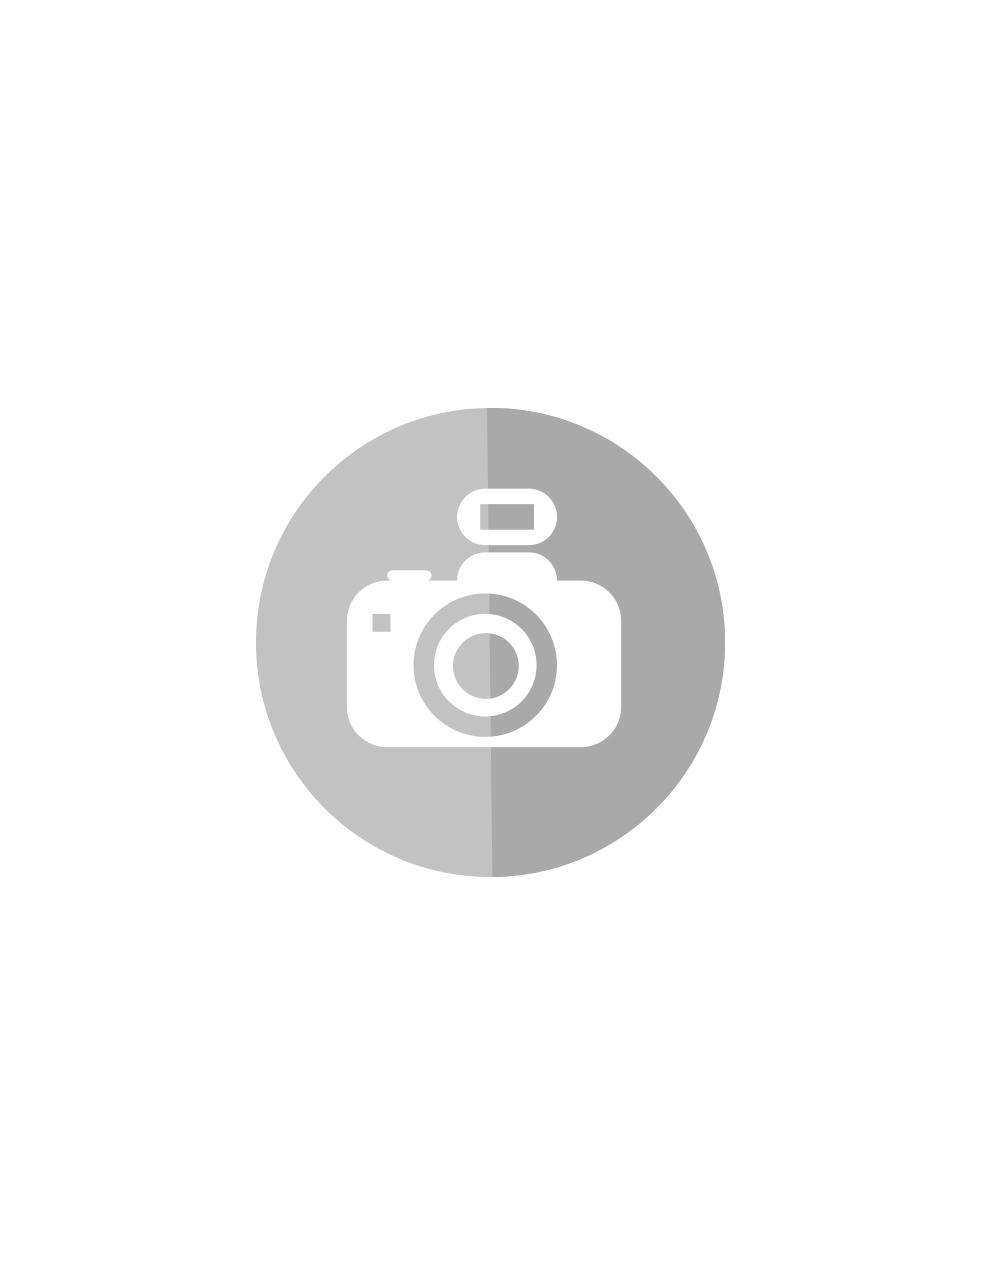 30053180_sparepart/Decke F. Wiege